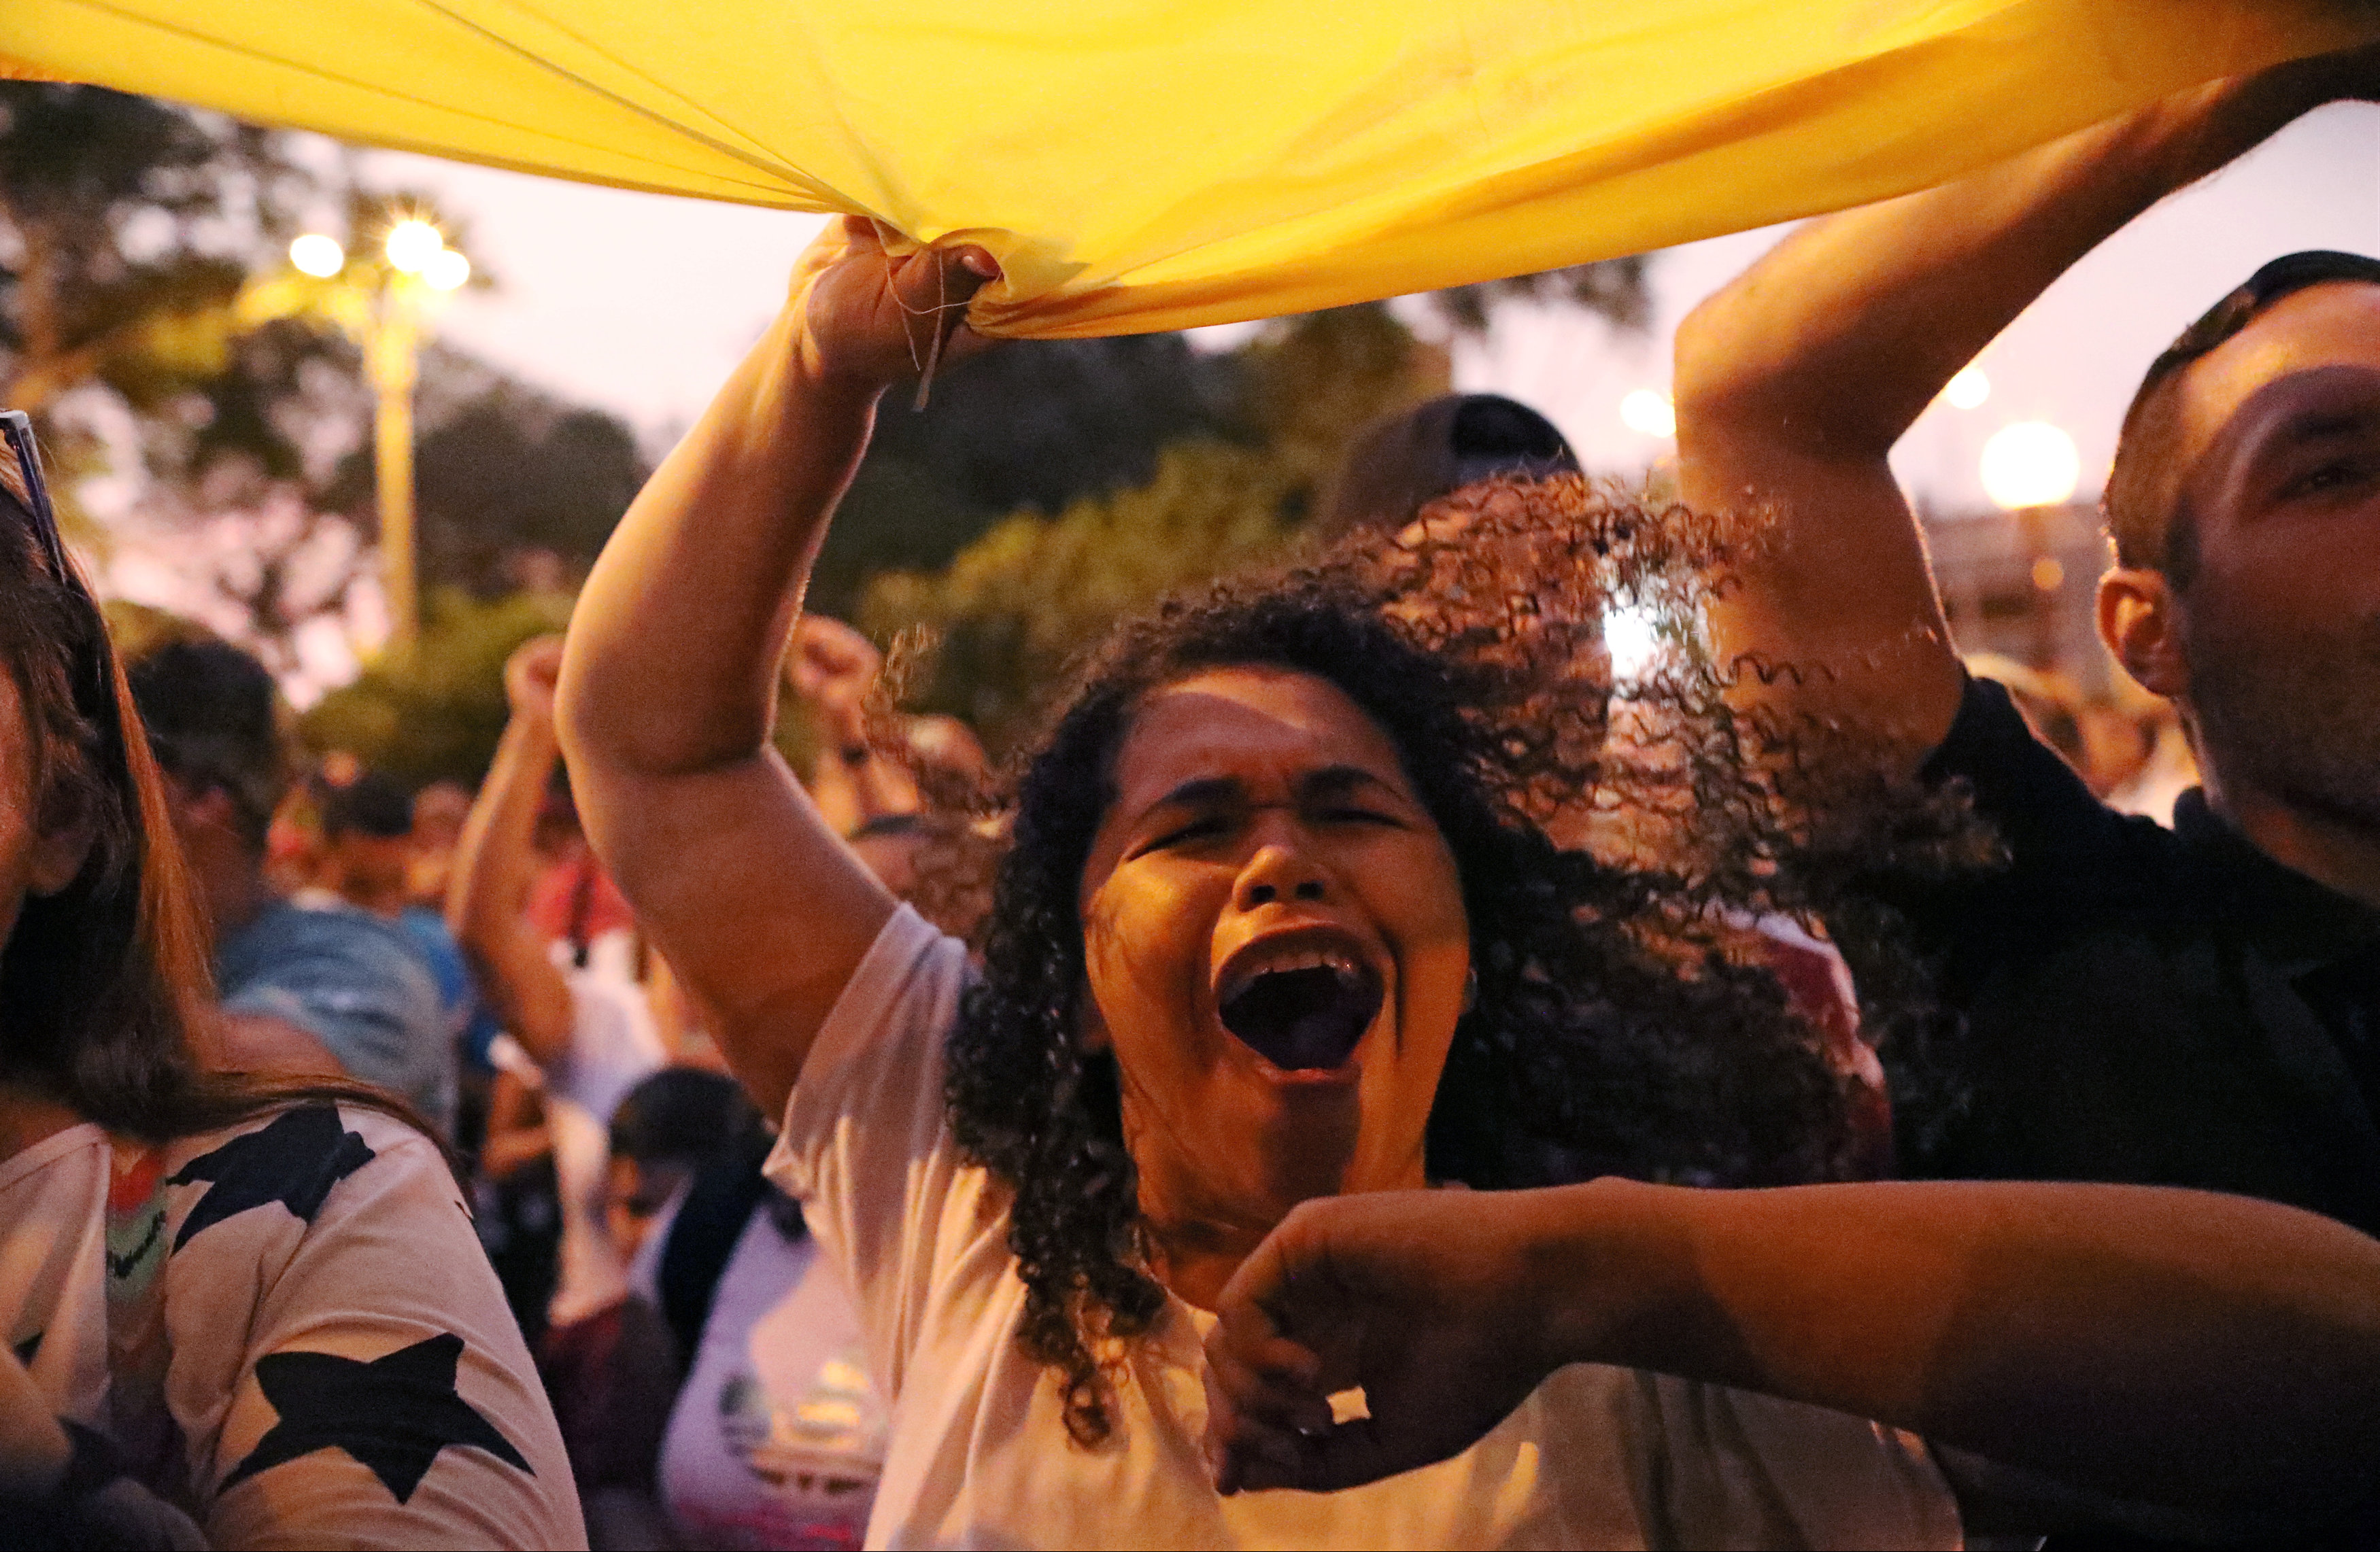 Lima, Perú. (REUTERS/Mariana Bazo)